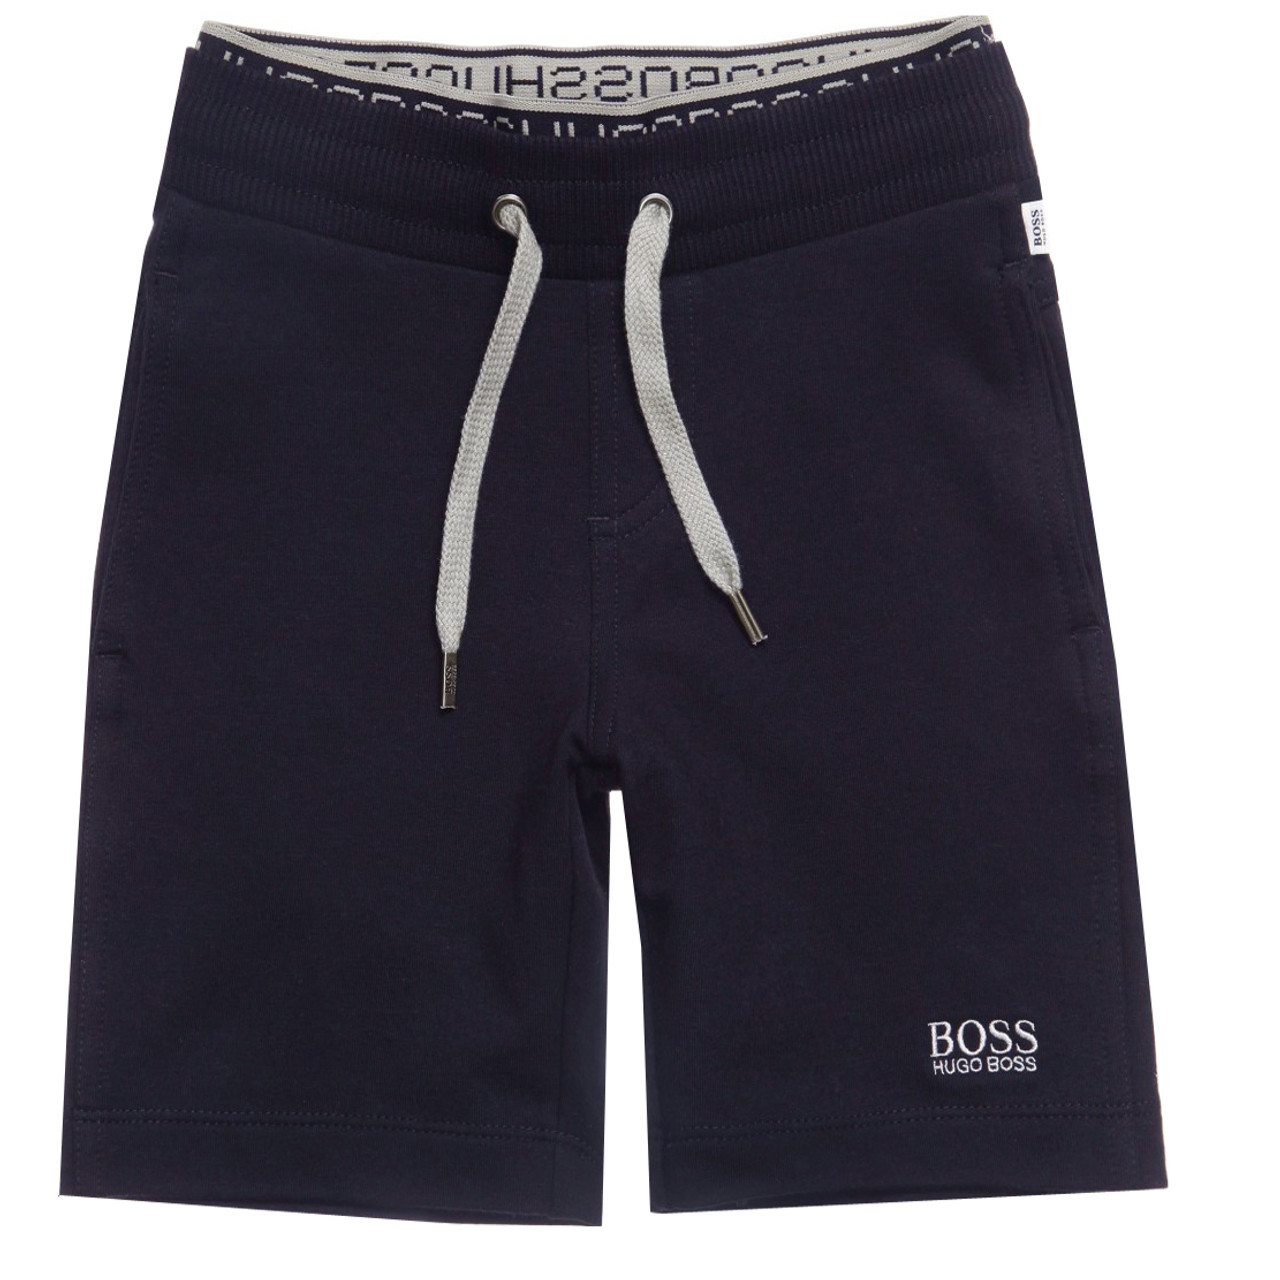 bd6def22 BOSS Navy Jersey Shorts - Le Petit Kids